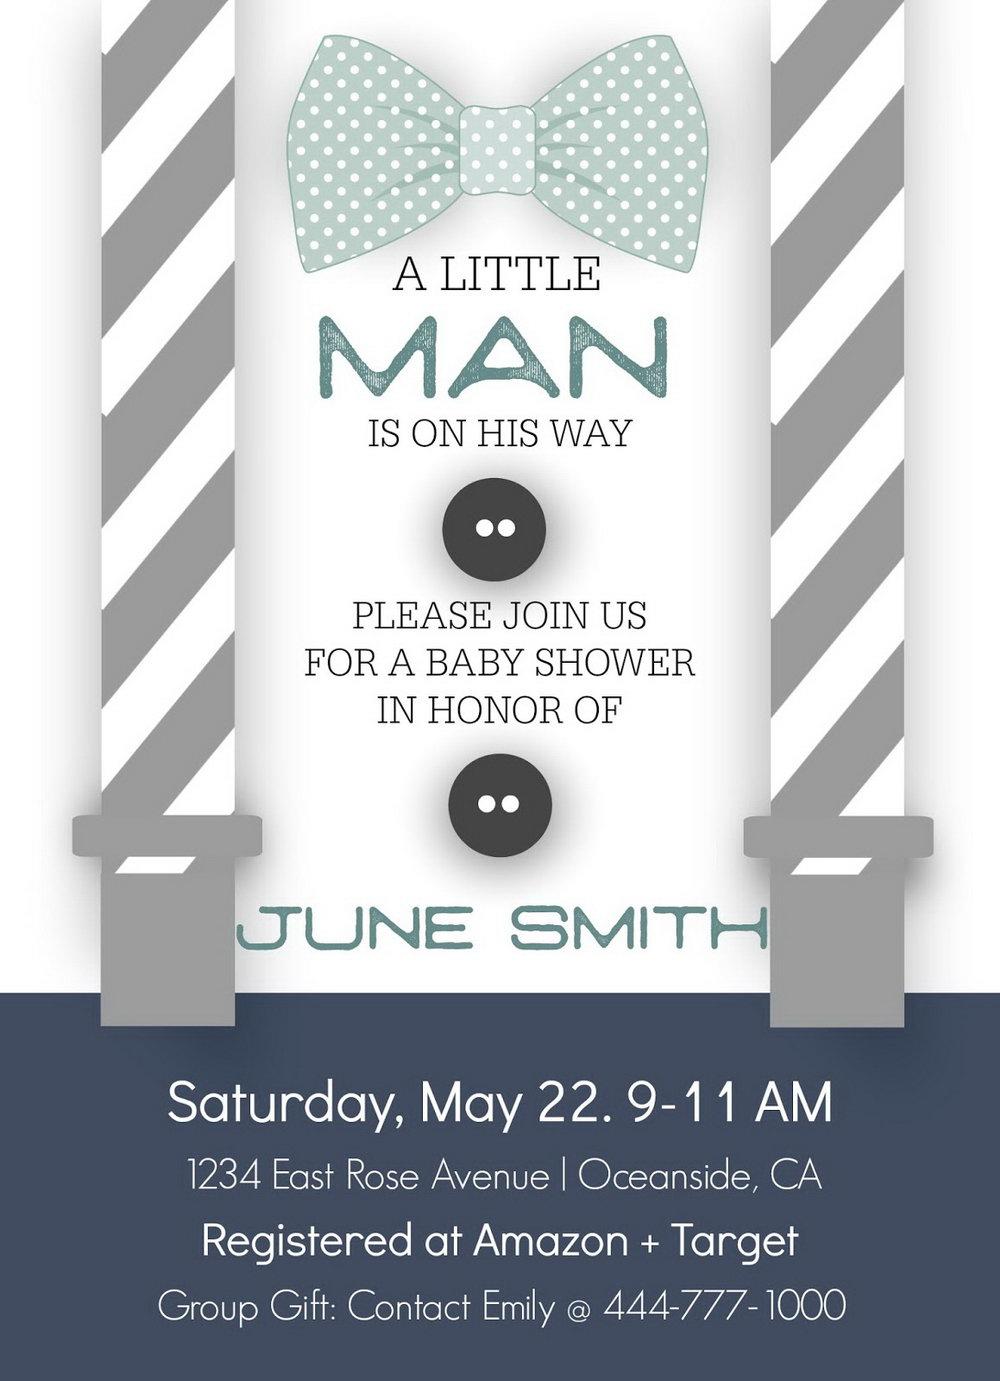 Little Man Baby Shower Invitation Templates Free